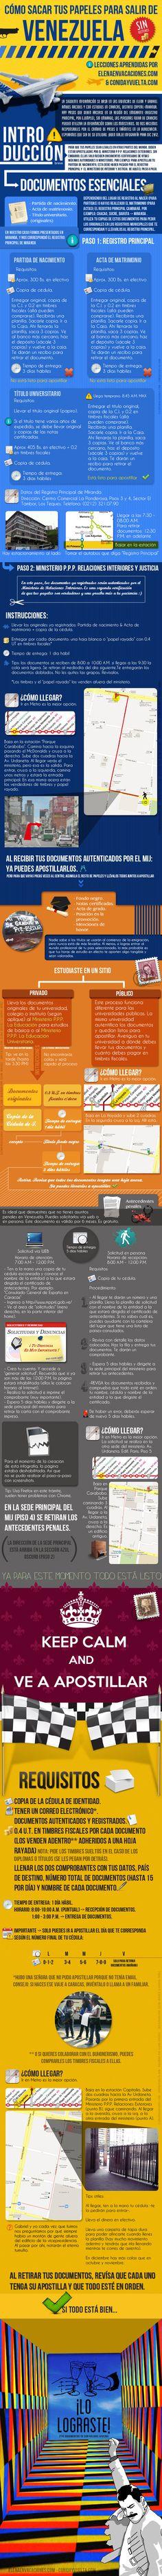 Cómo sacar tus papeles para salir de Venezuela #infografia